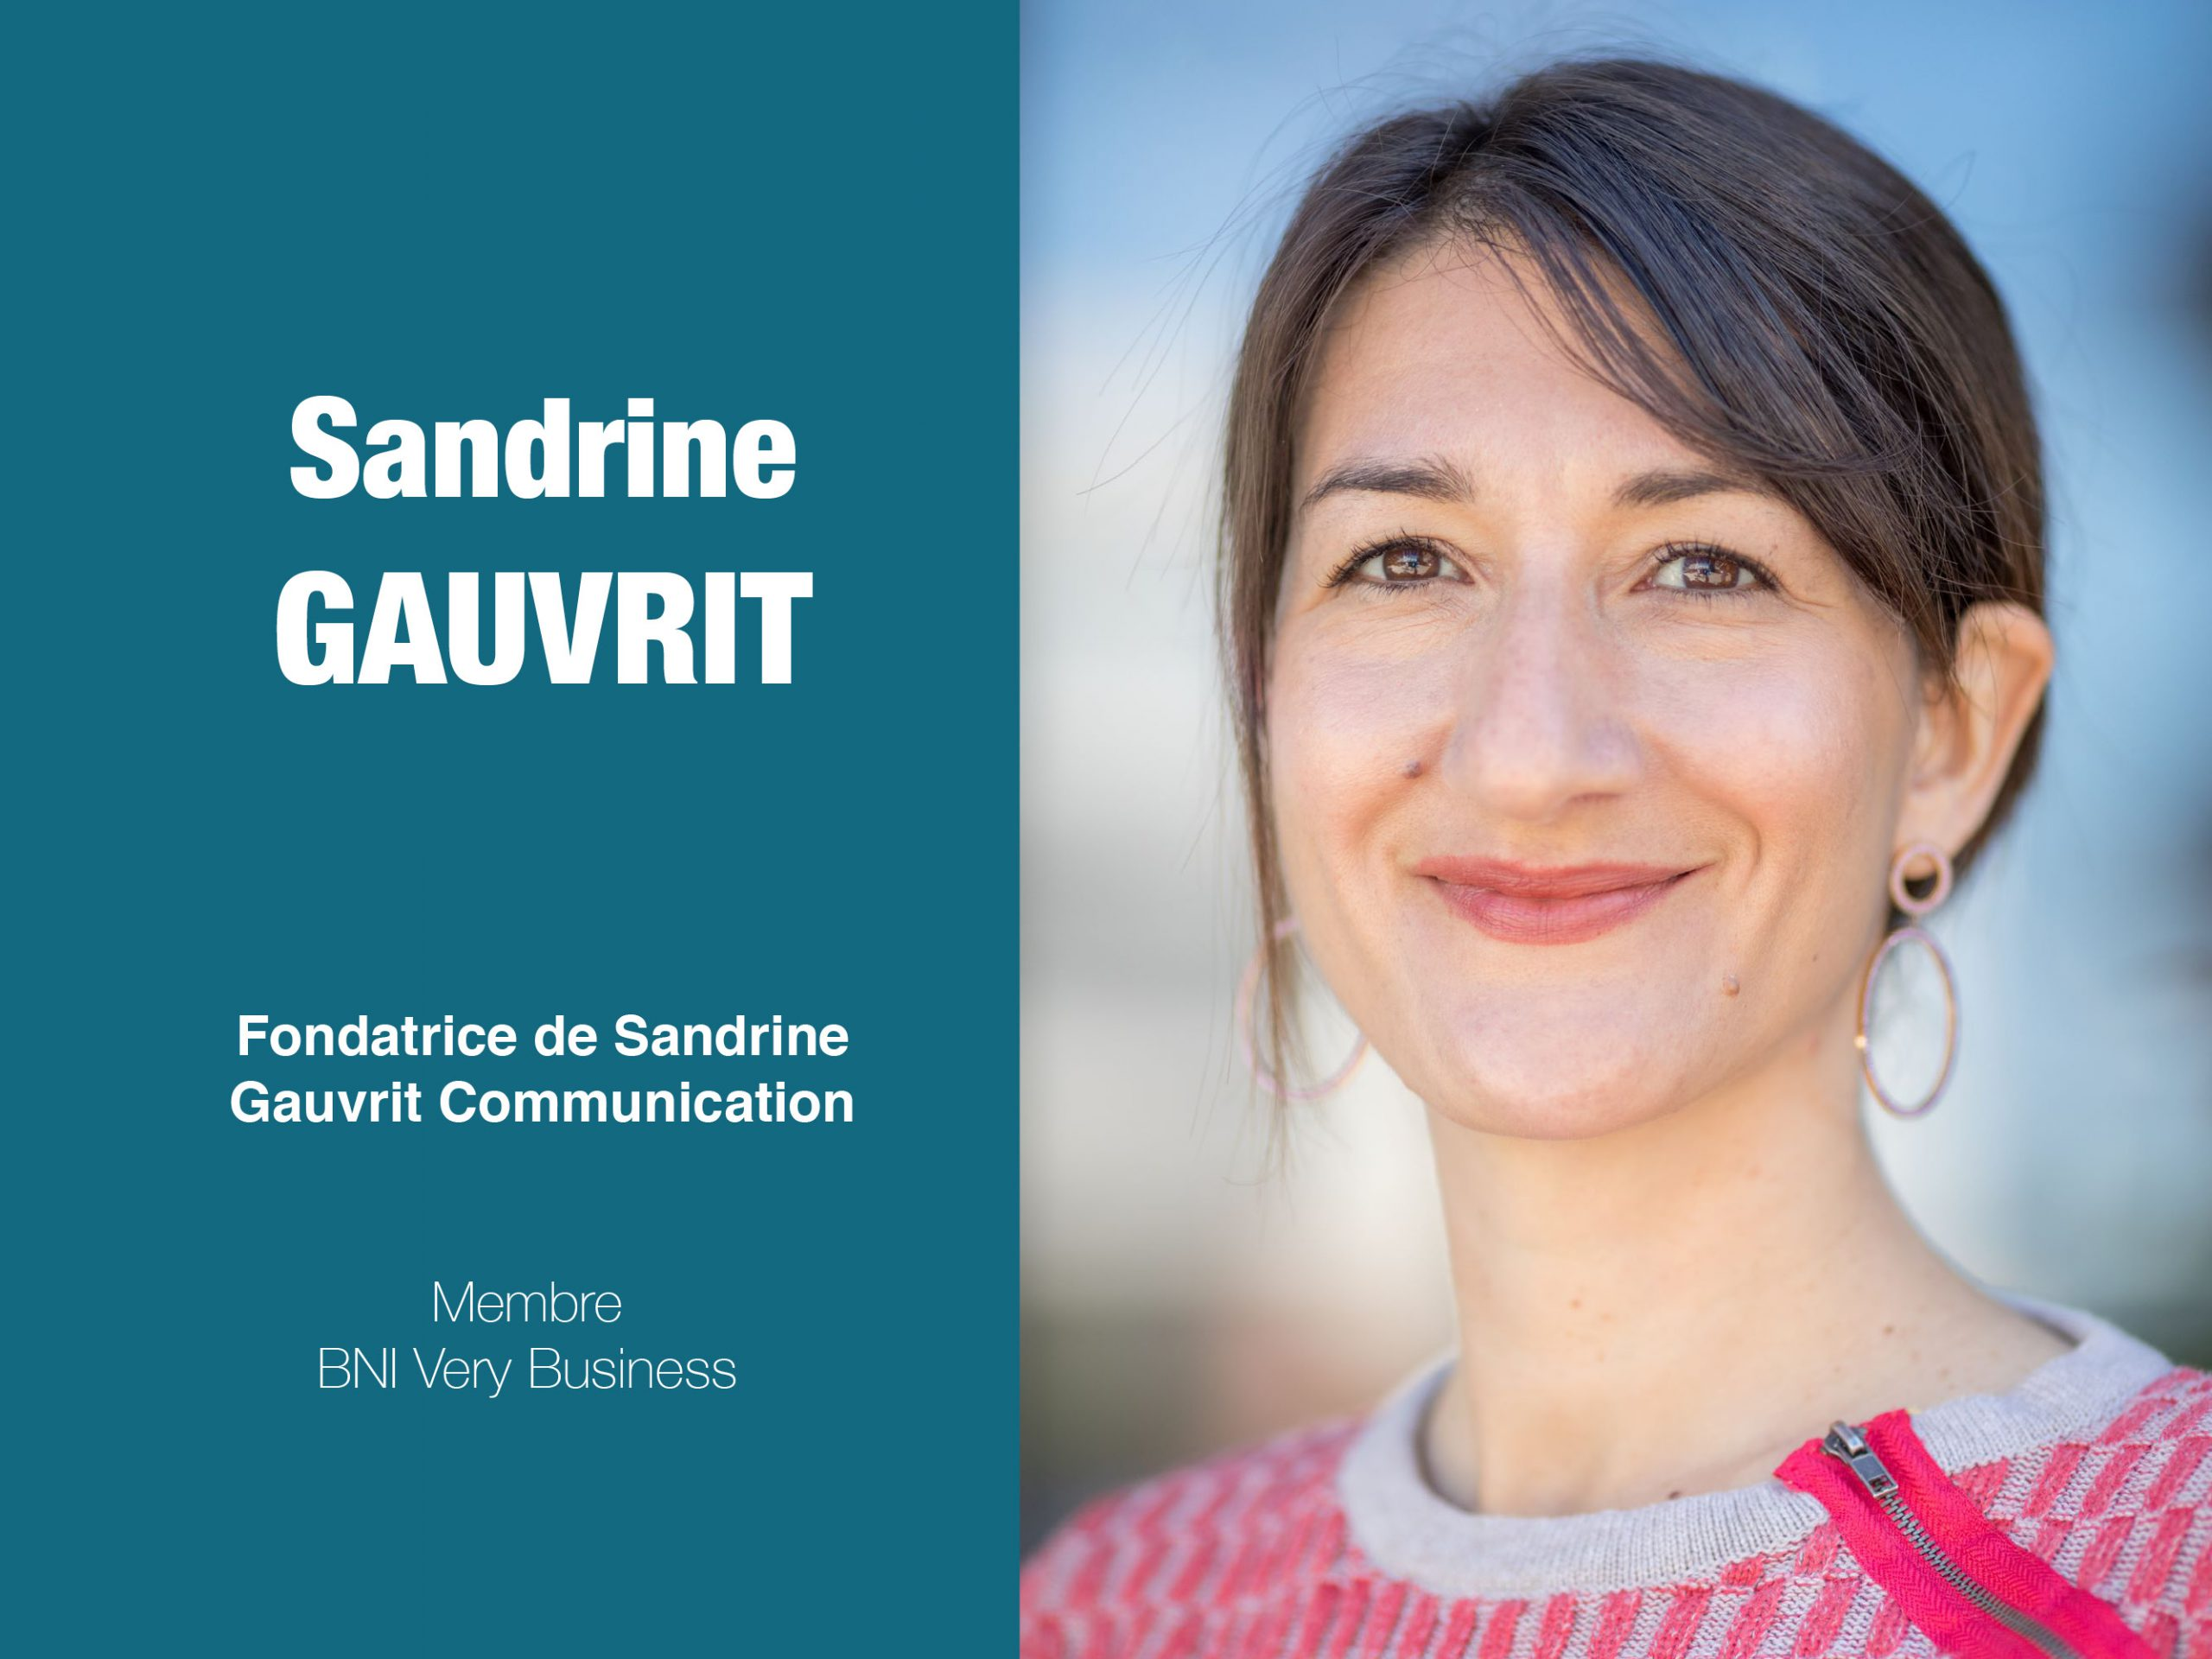 Sandrine Gauvrit BNI Very Business